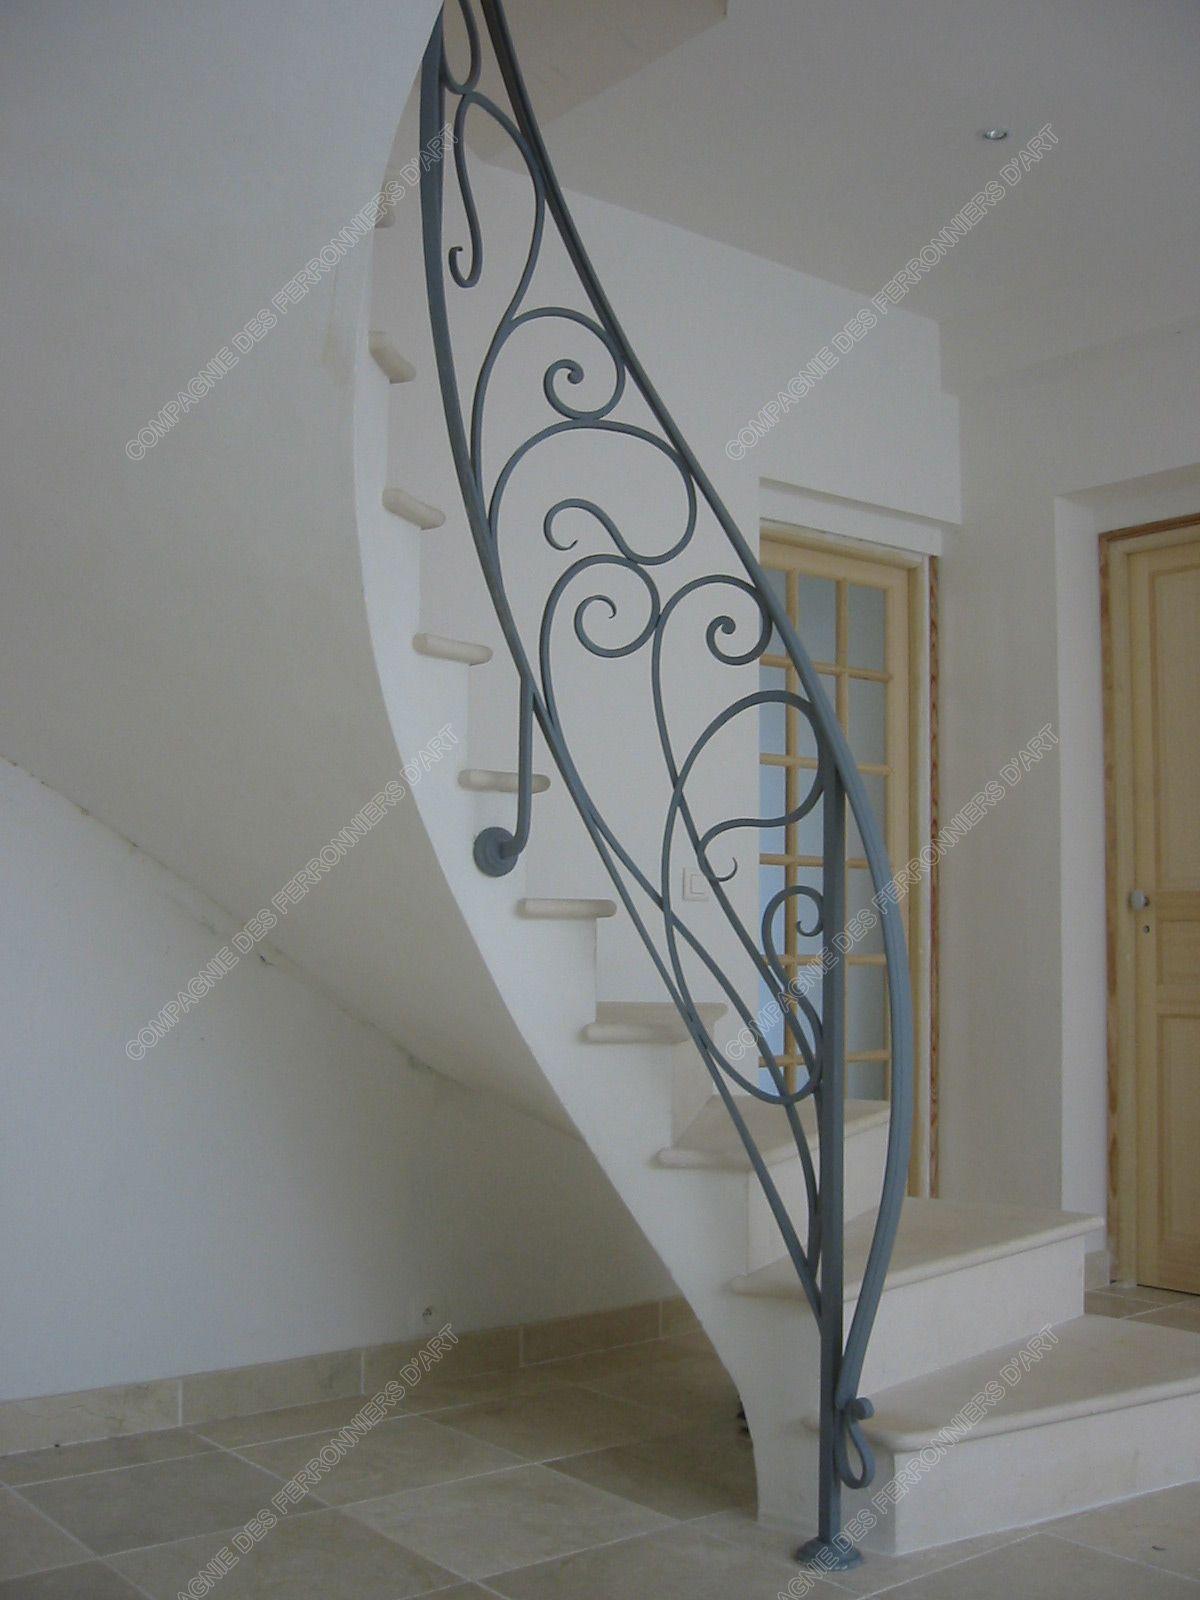 rampes d 39 escalier en fer forg style art nouveau mod le. Black Bedroom Furniture Sets. Home Design Ideas